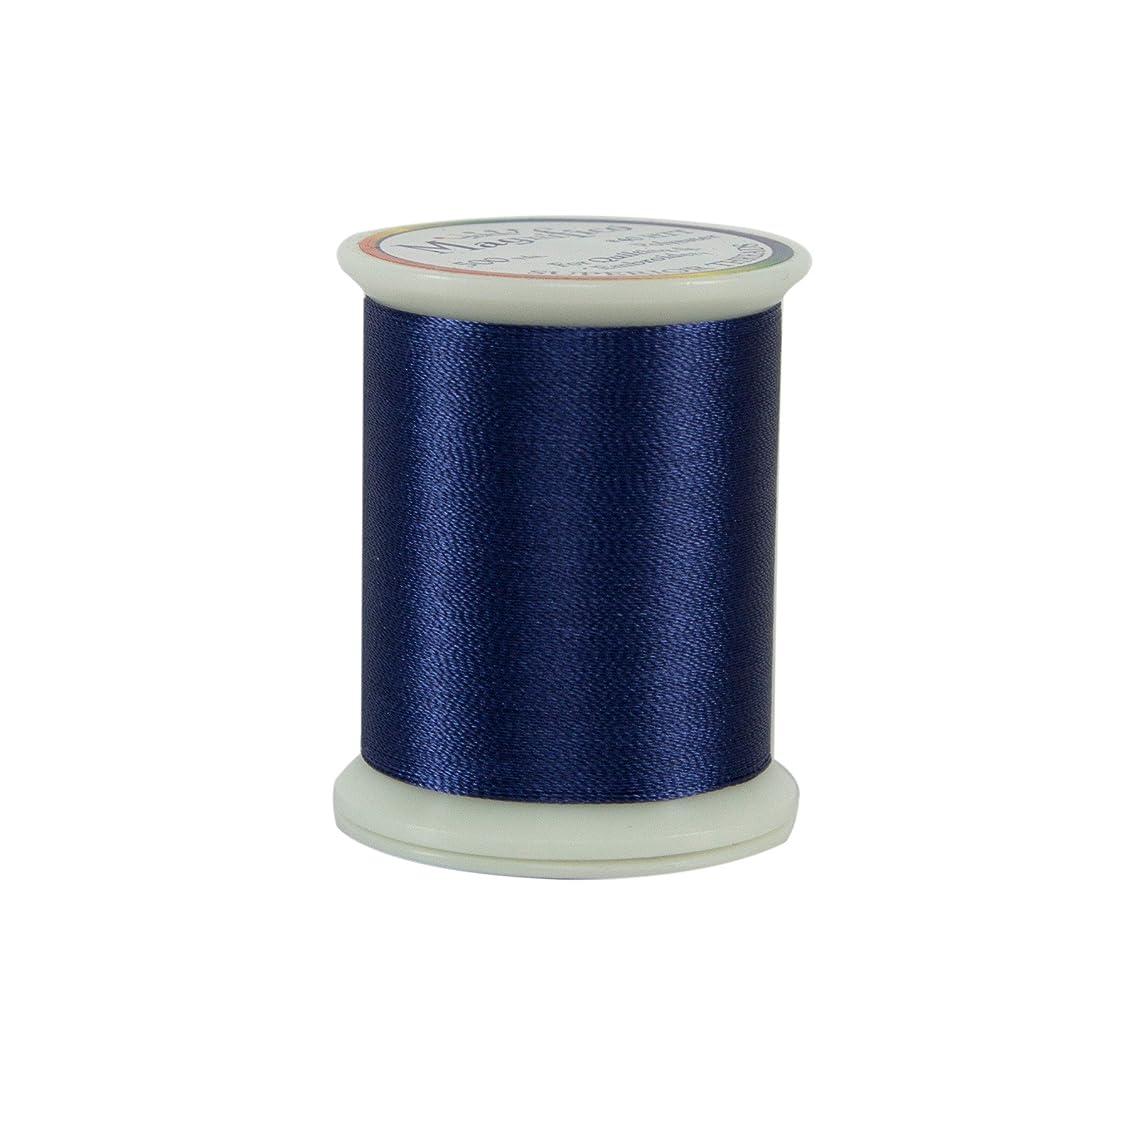 Superior Threads - Magnifico Polyester Thread - Cadet Blue - 500-Yard Spool hzdkz86250346770